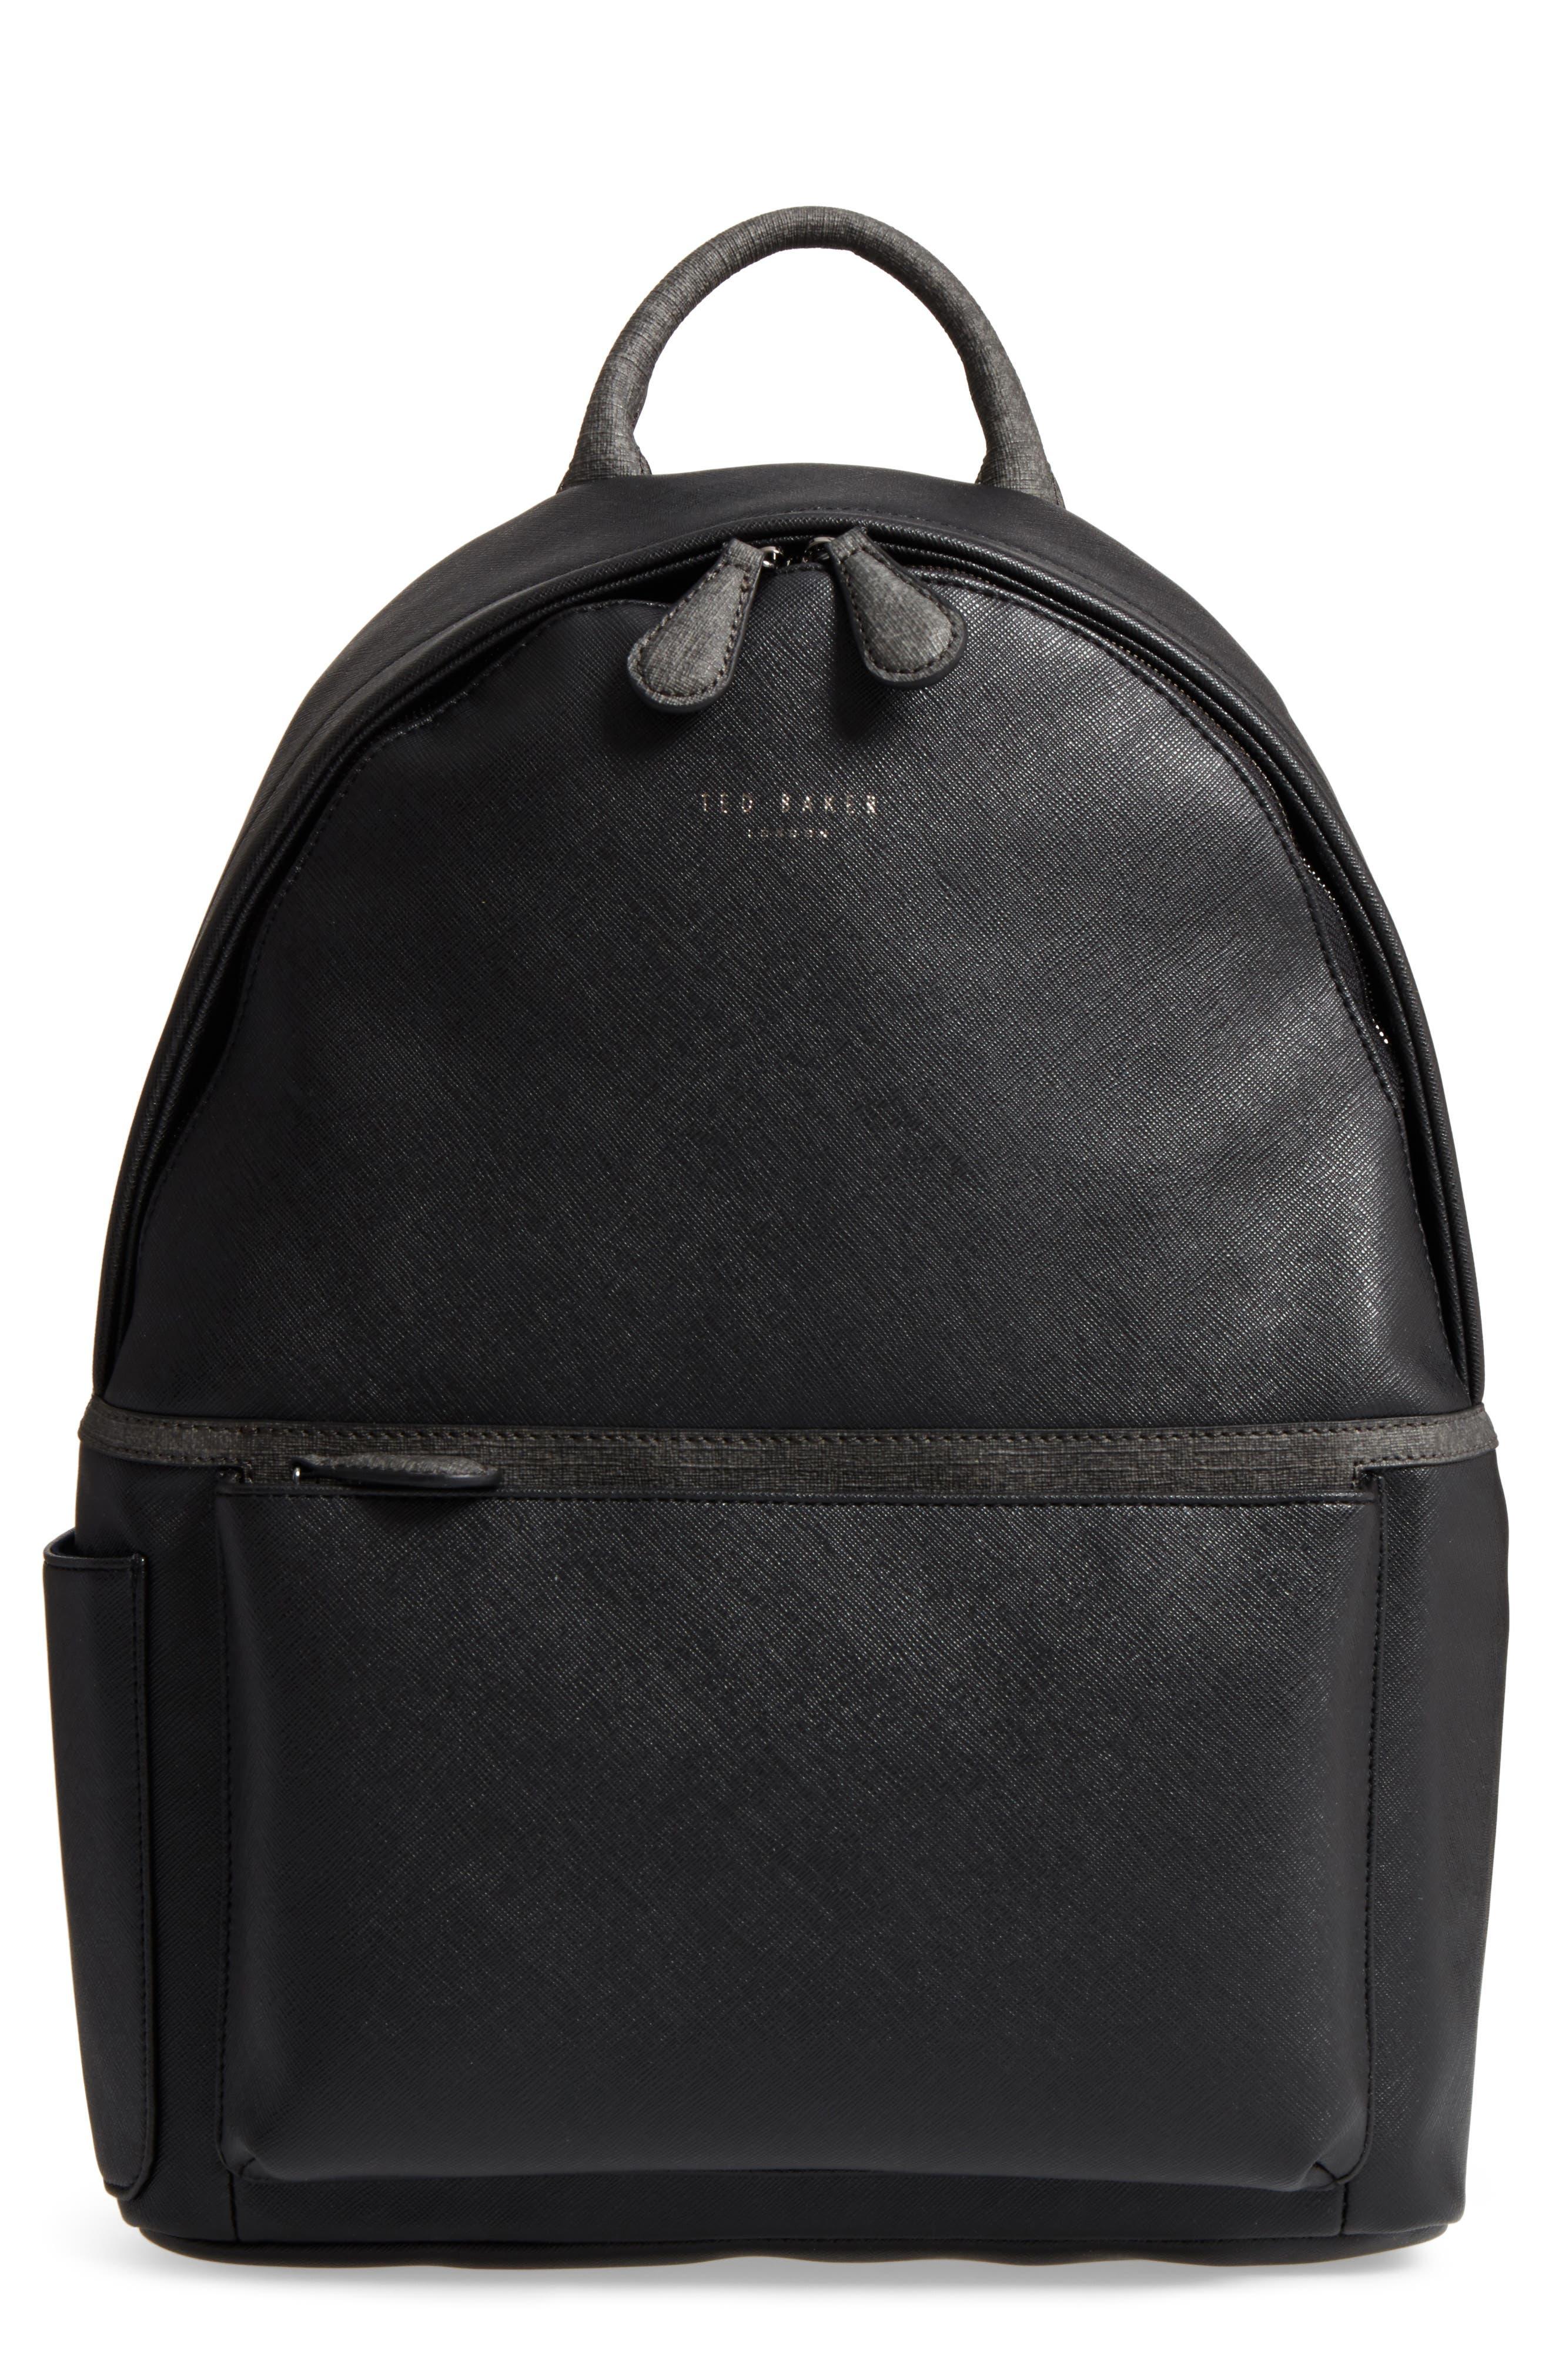 Fangs Backpack,                         Main,                         color, Black